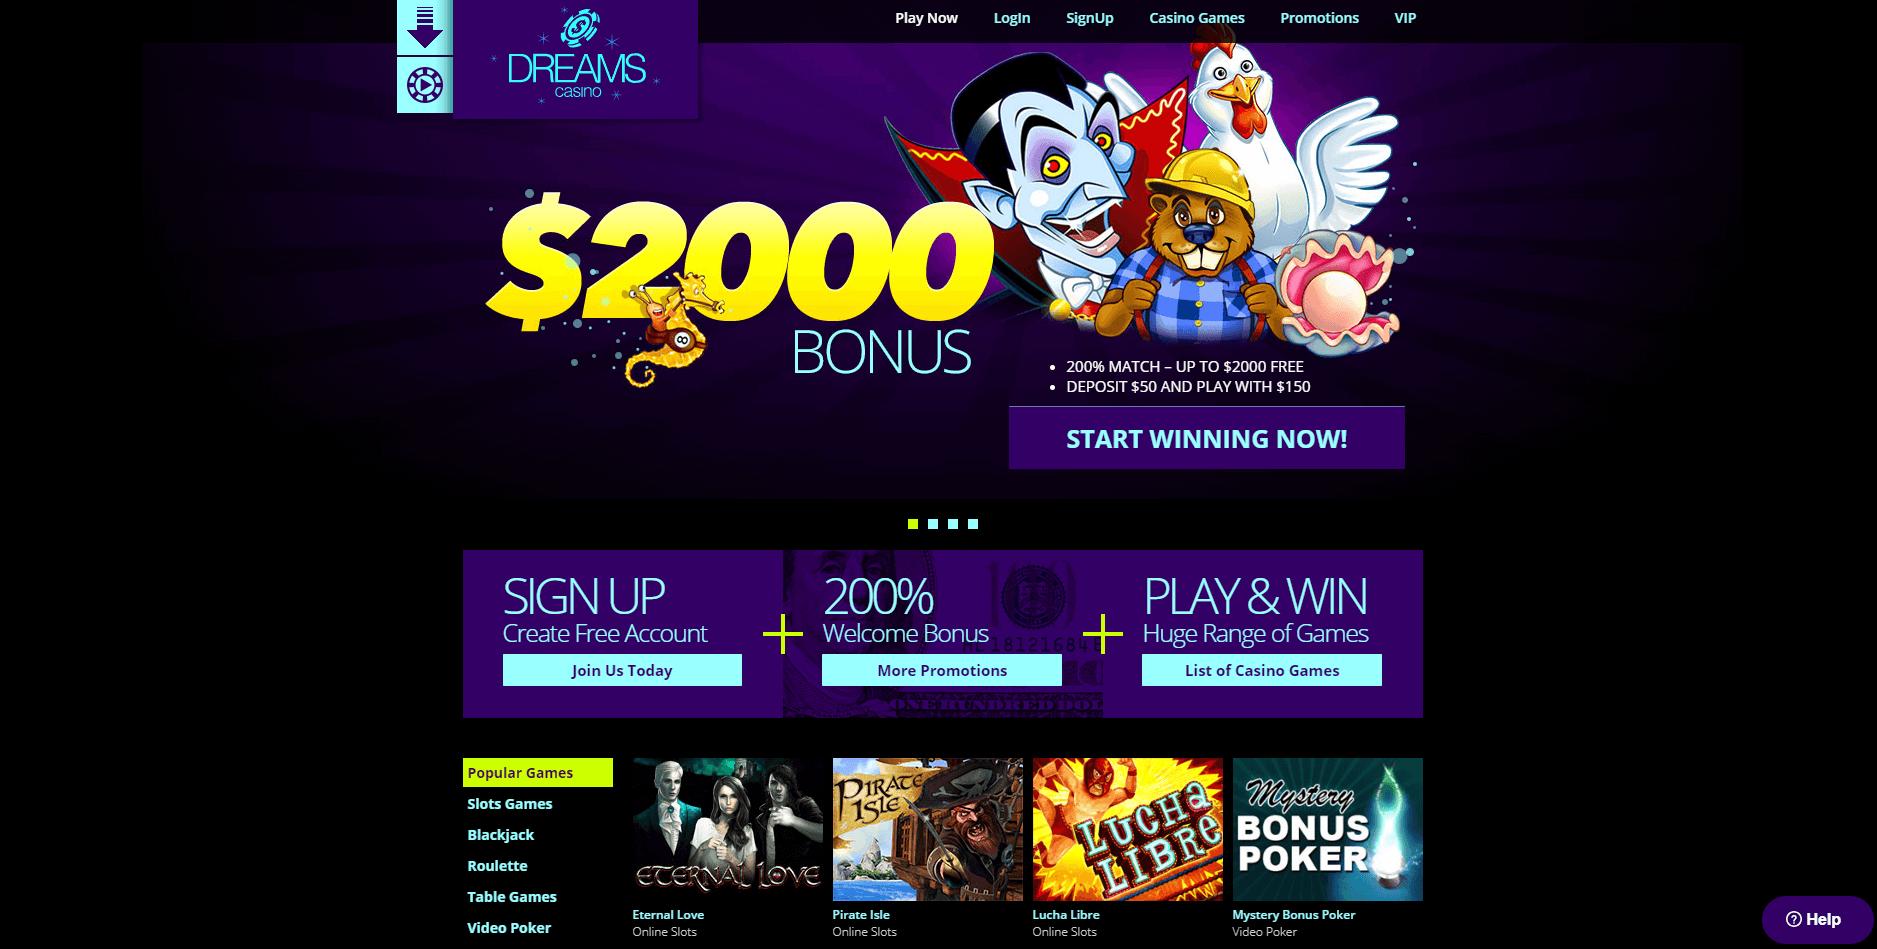 Dreams Casino Free Spins Bonus 2020 Yummyspins